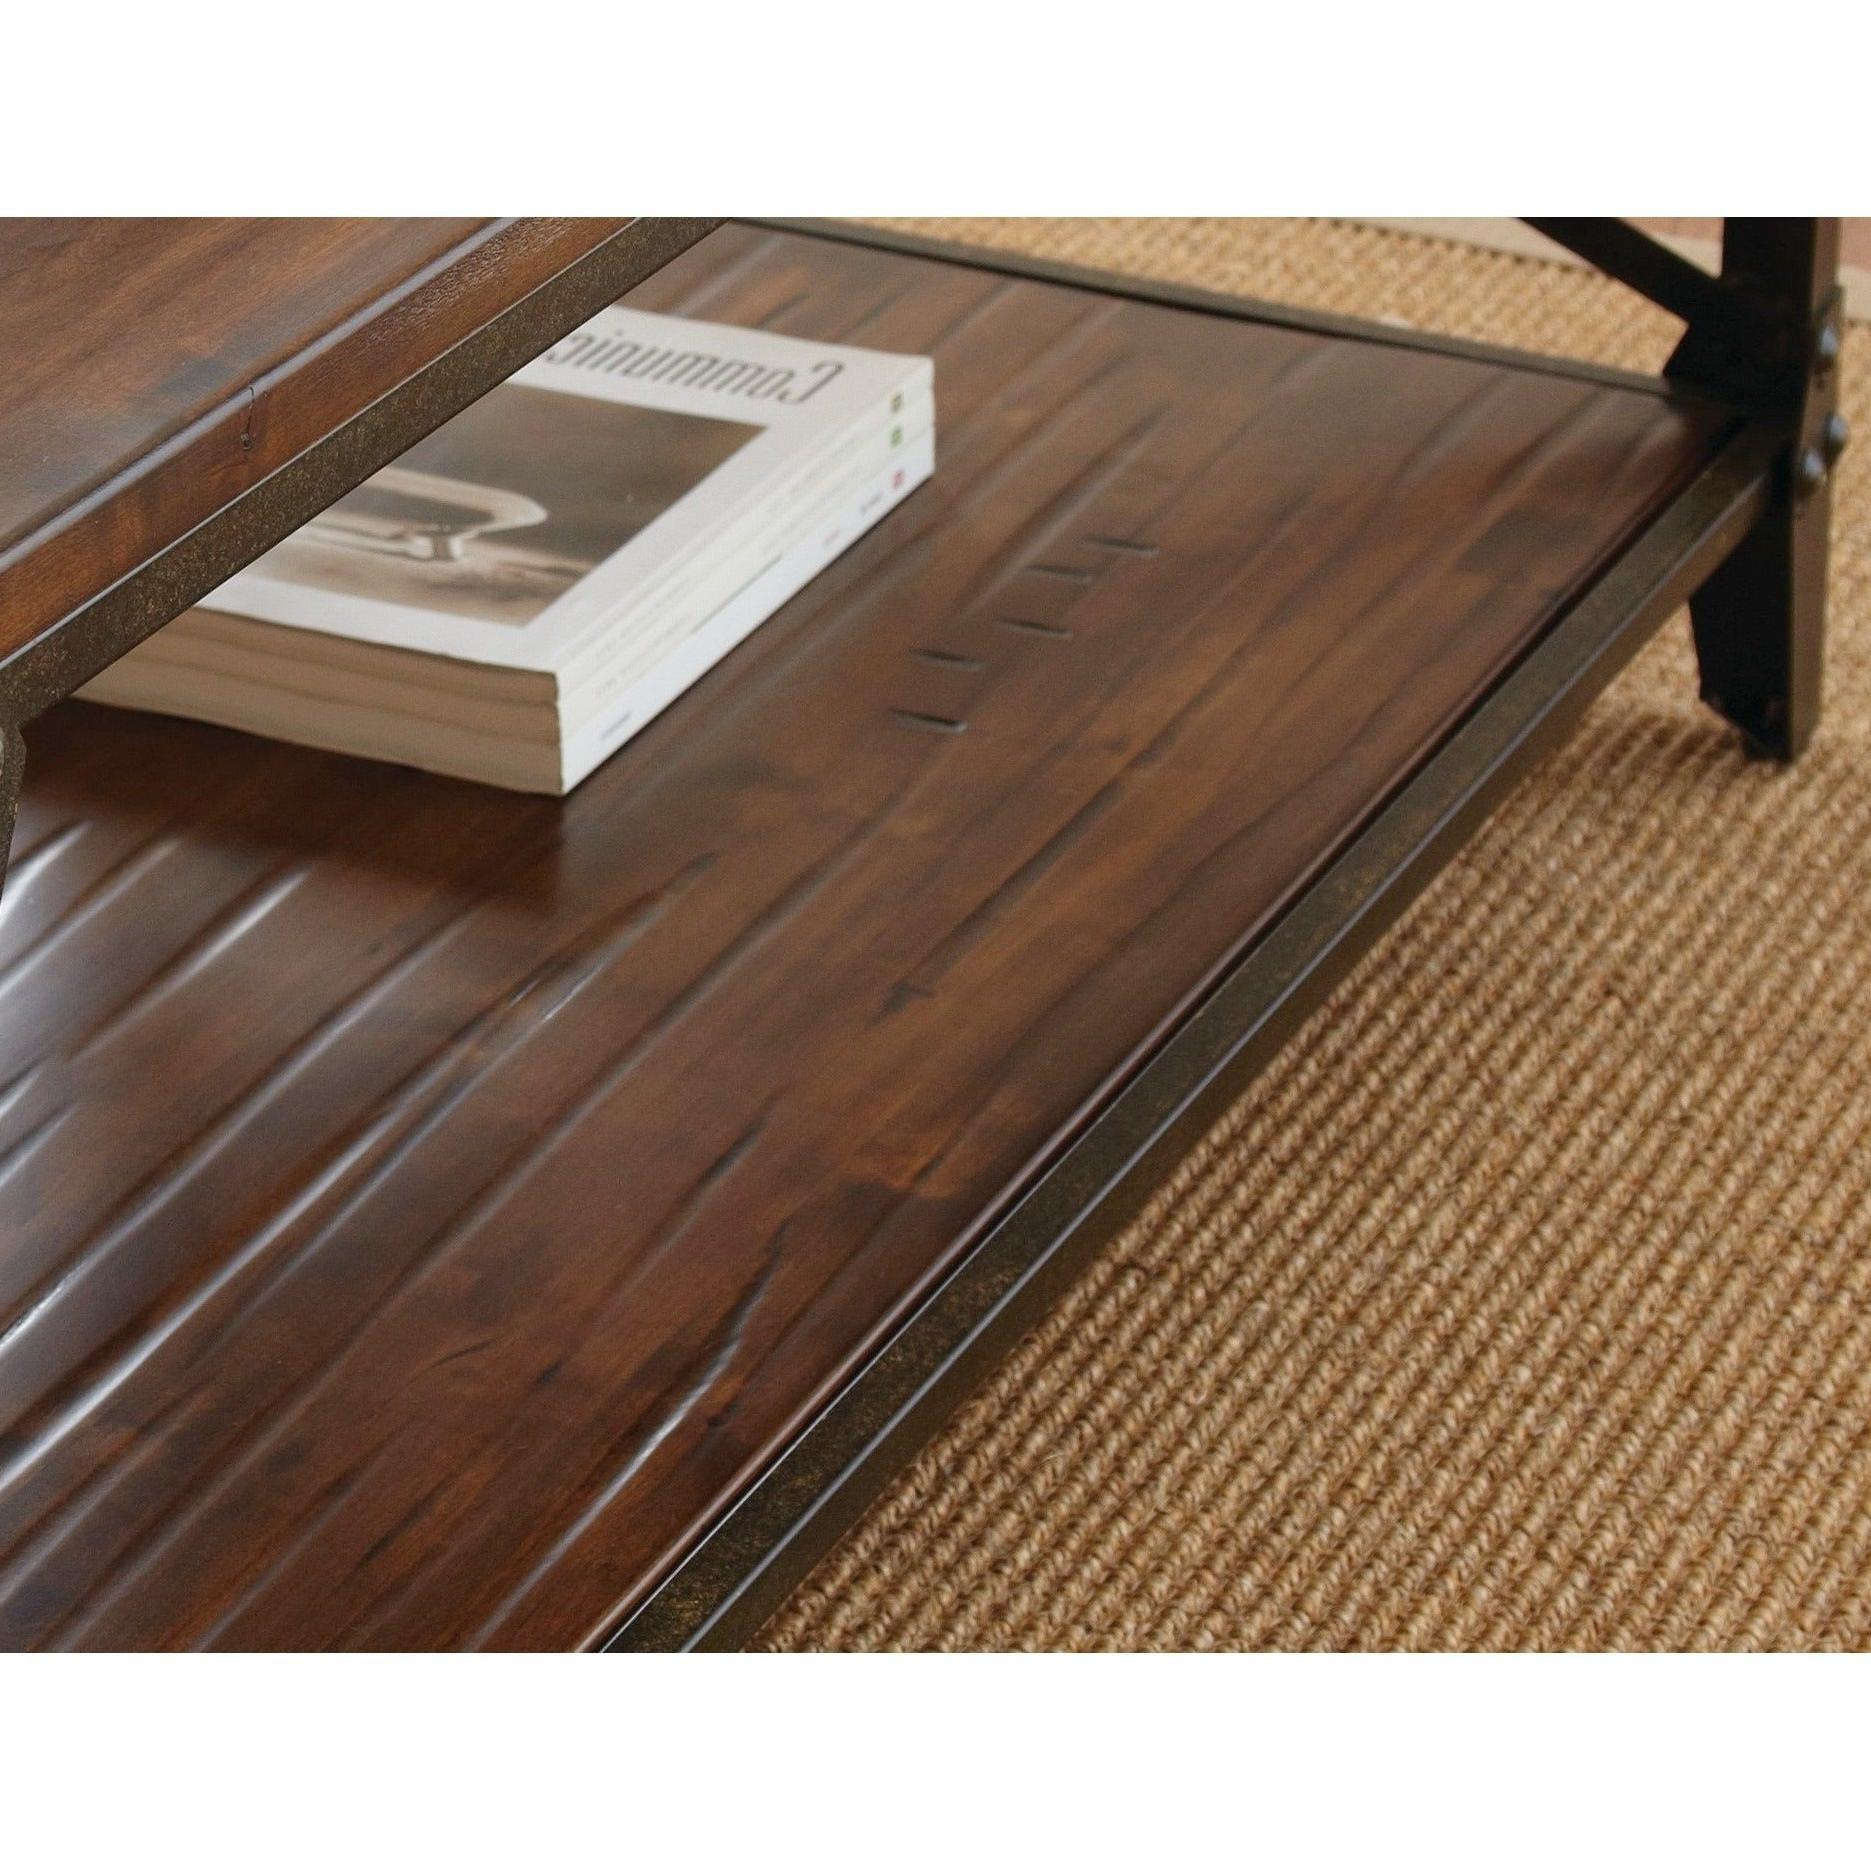 Popular Carbon Loft Kenyon Cube Brown Wood Rustic Coffee Tables Regarding Carbon Loft Fischer Brown Solid Birch And Iron Rustic Coffee Table (View 16 of 20)